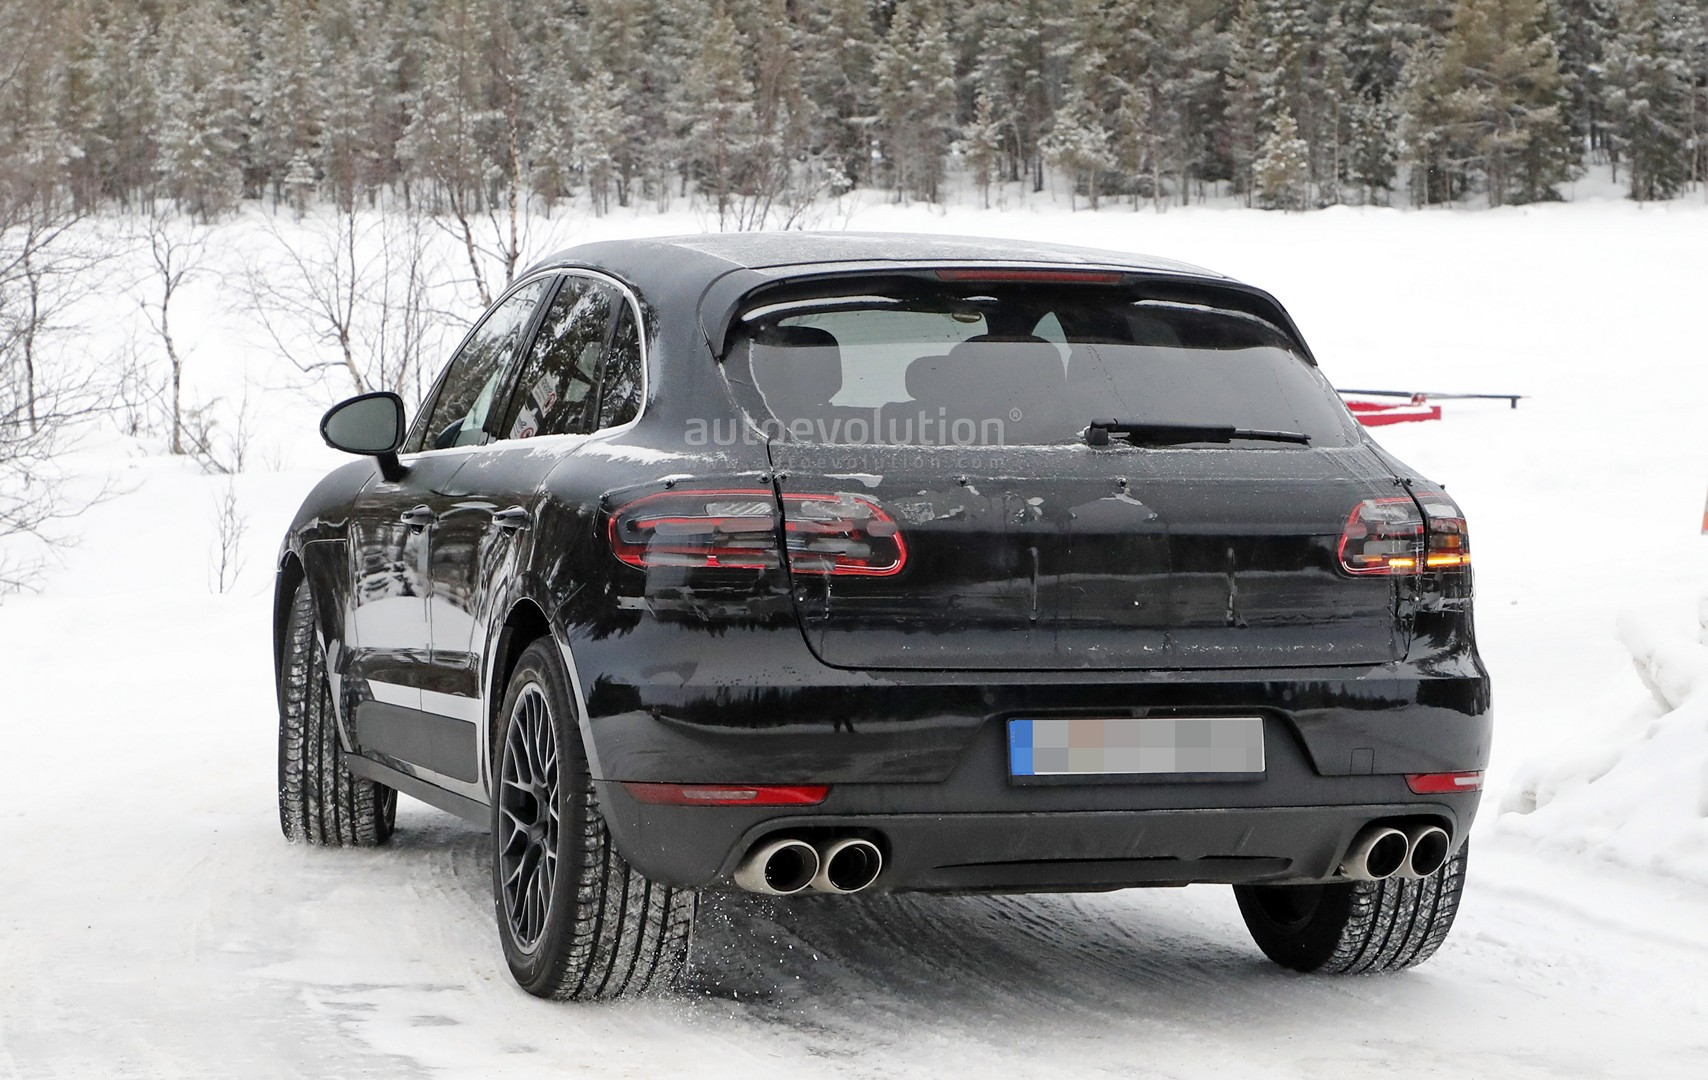 2018 Porsche Macan Facelift Spied Undergoing Winter